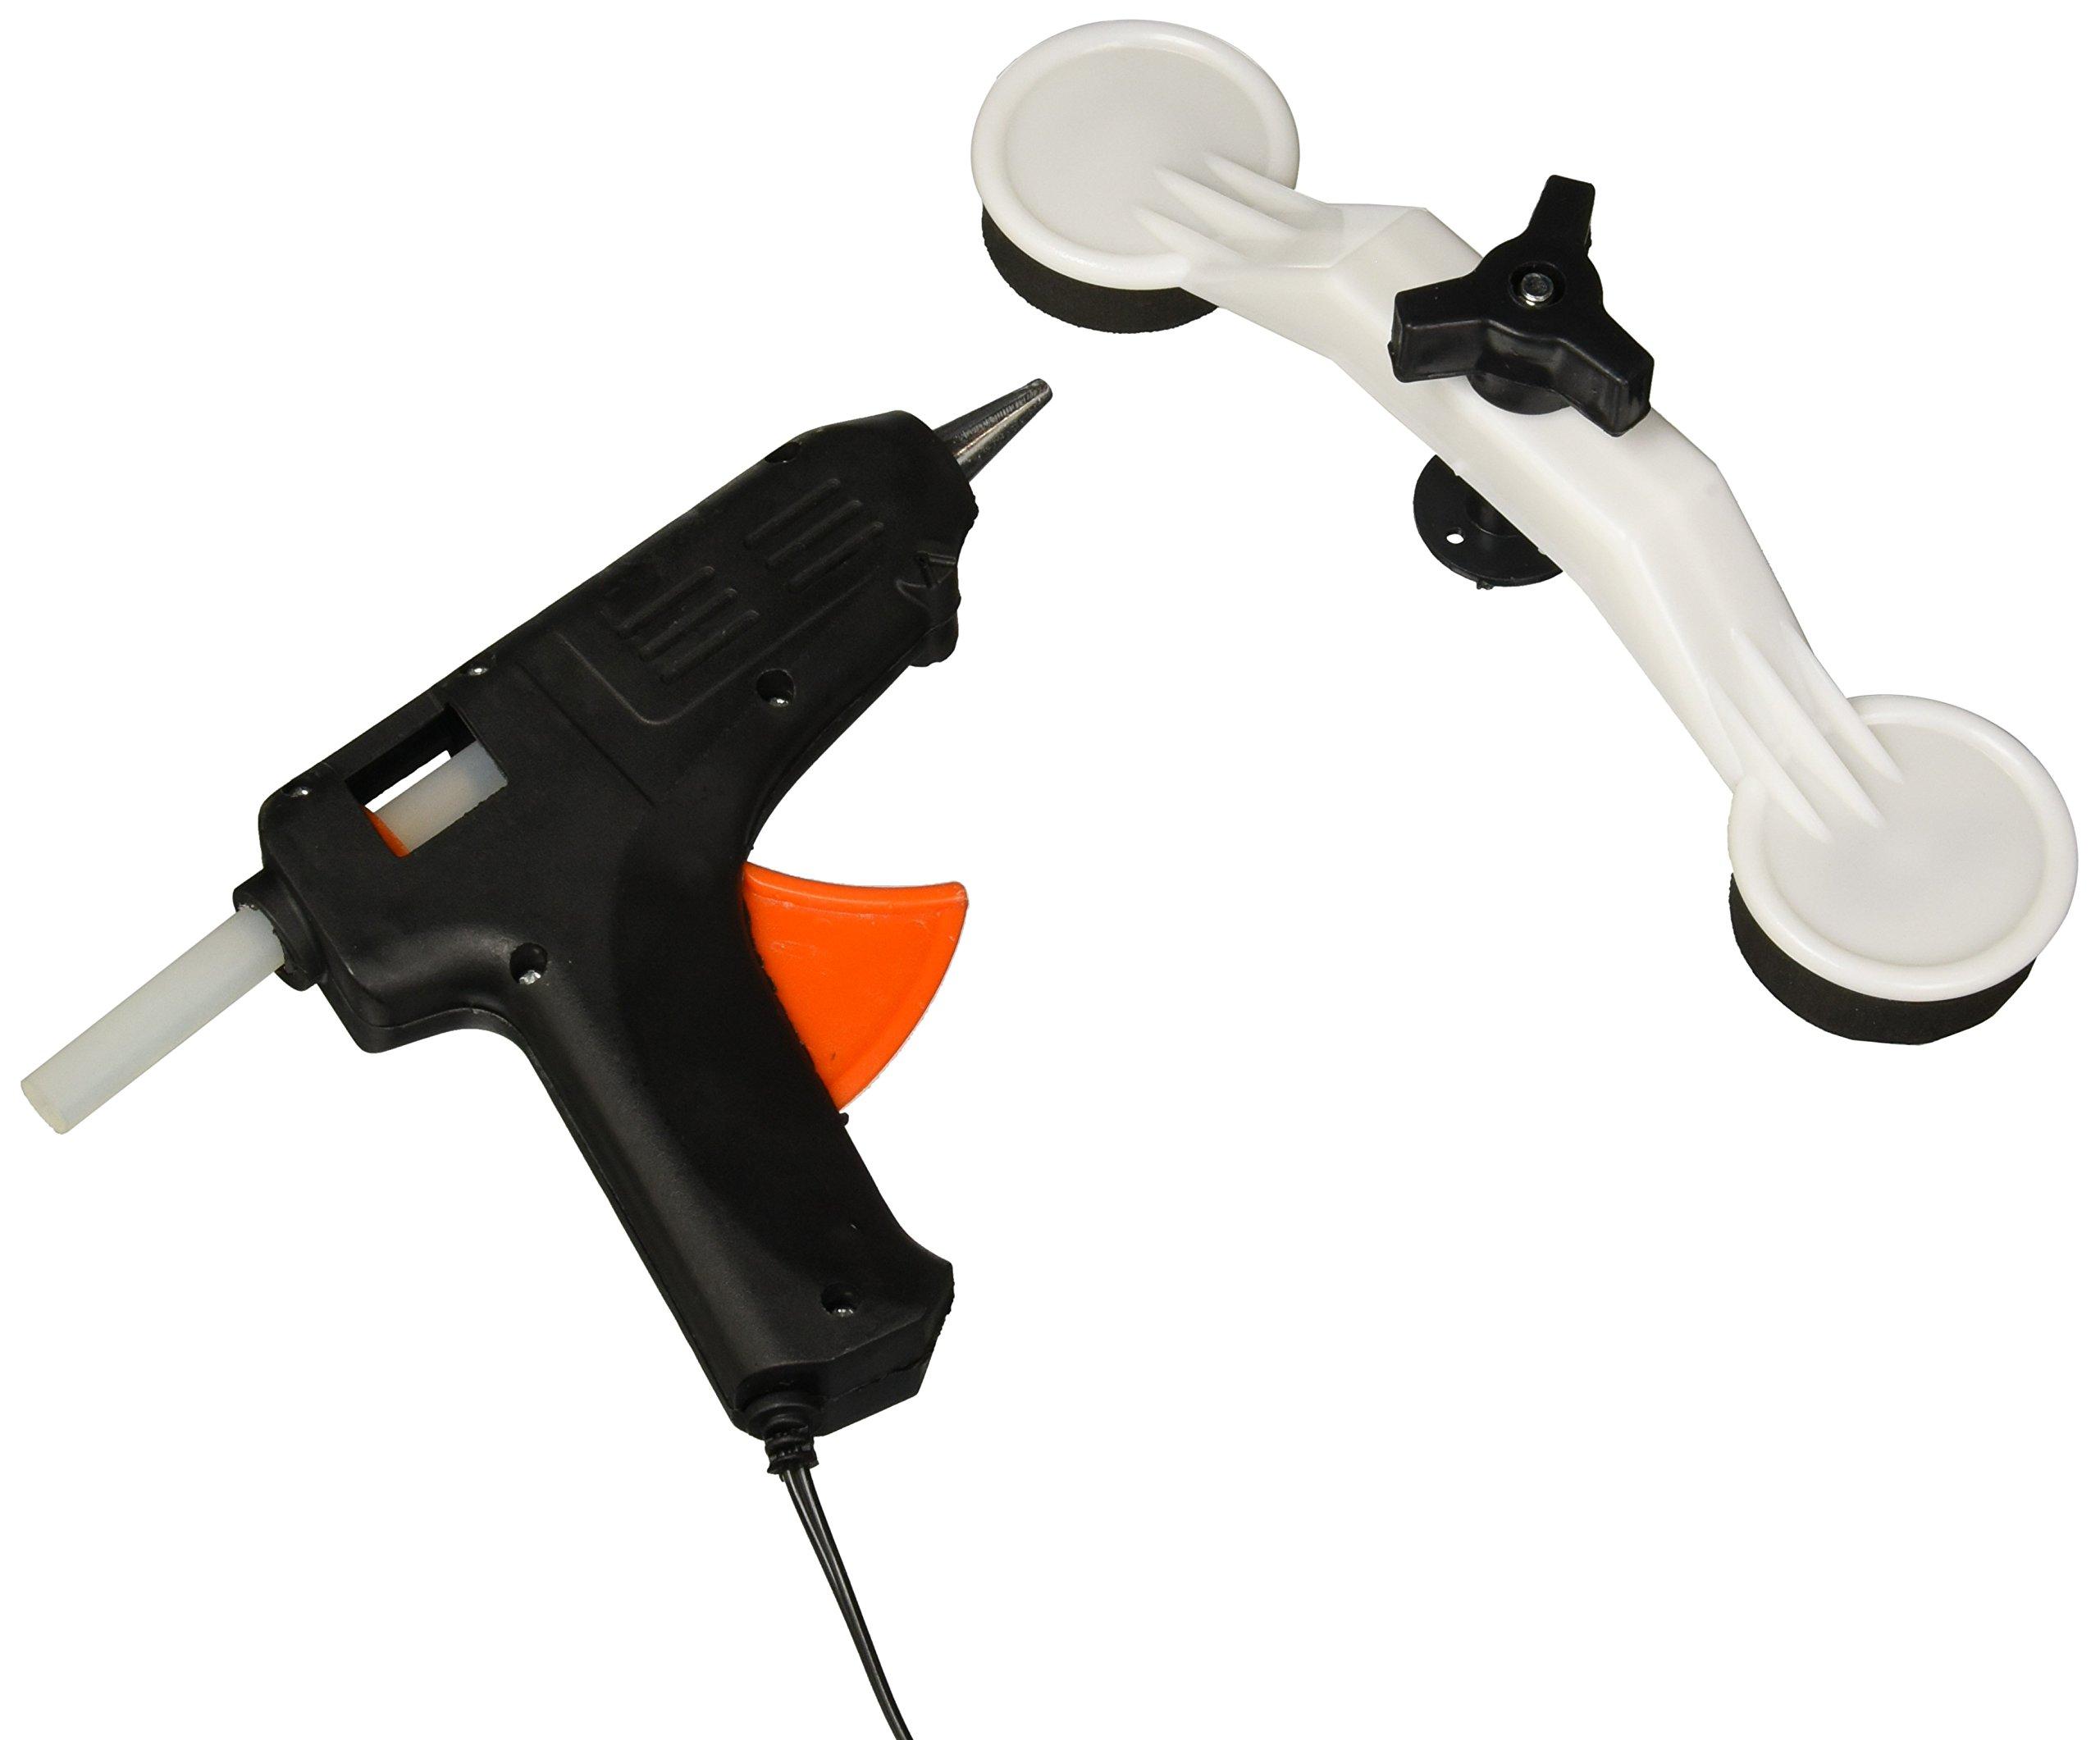 Pops-a-dent Dent & Ding Auto Car Repair KIT Popper DIY